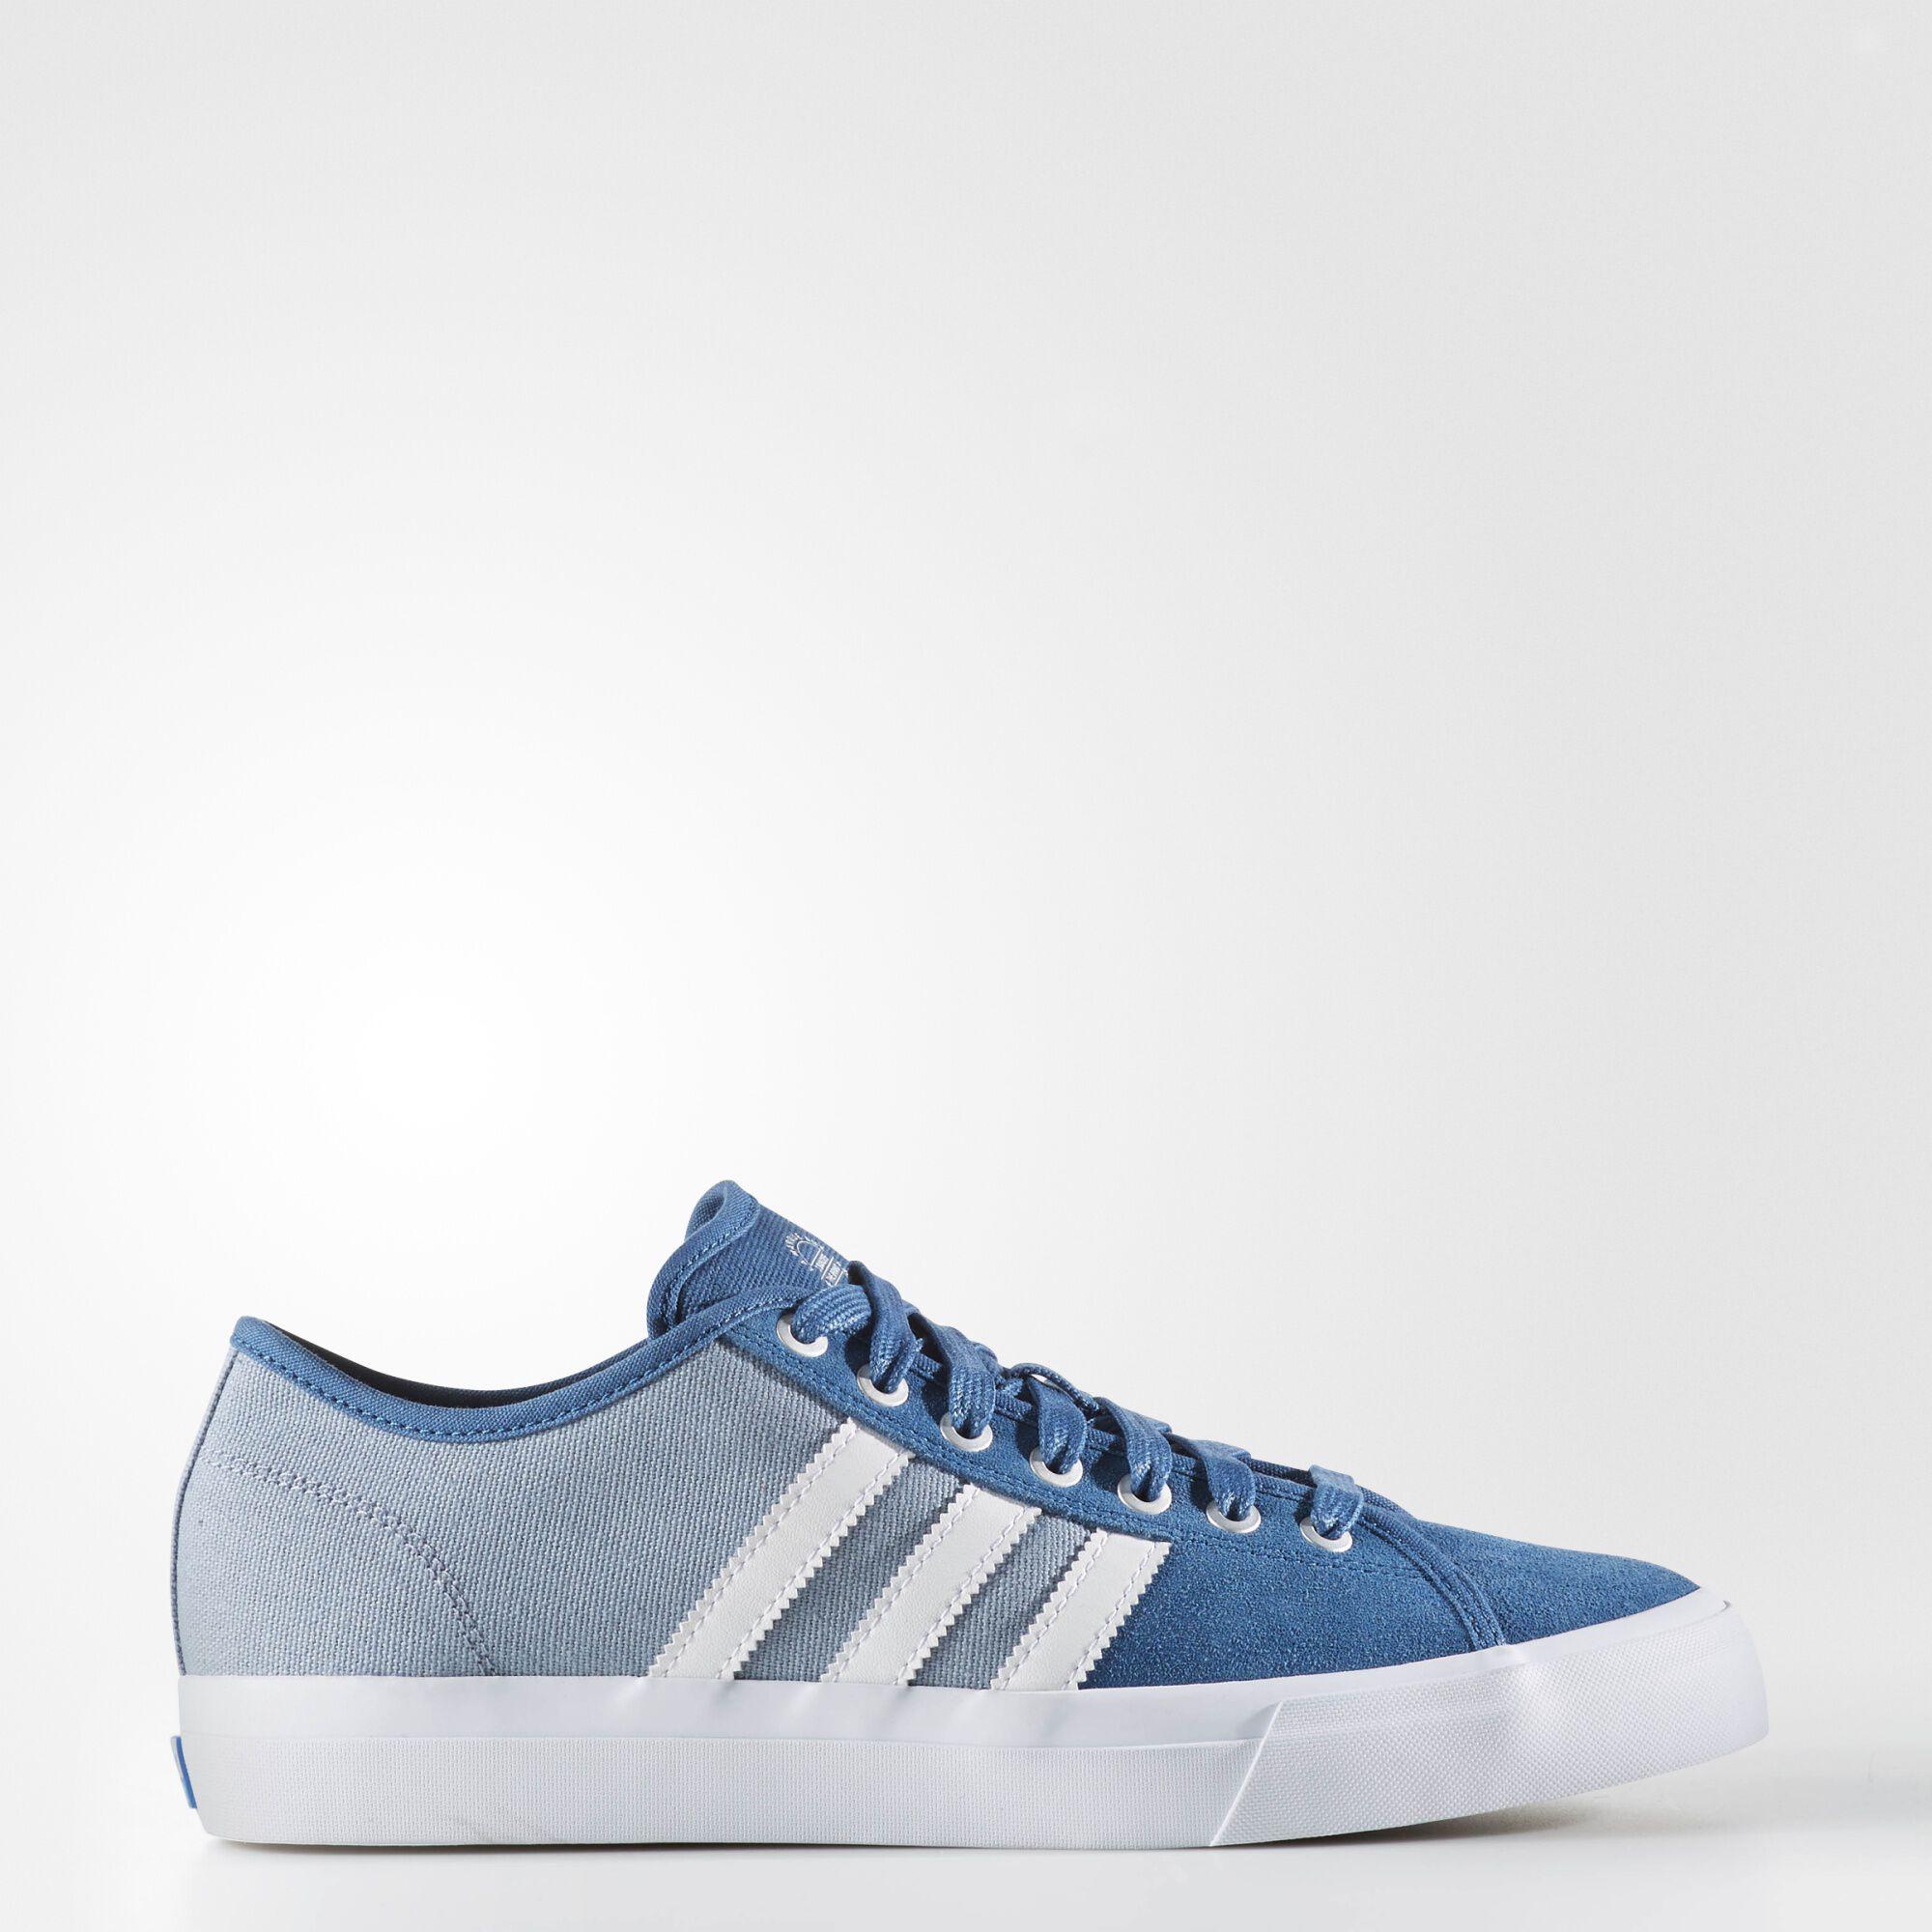 Adidas Shoes Island